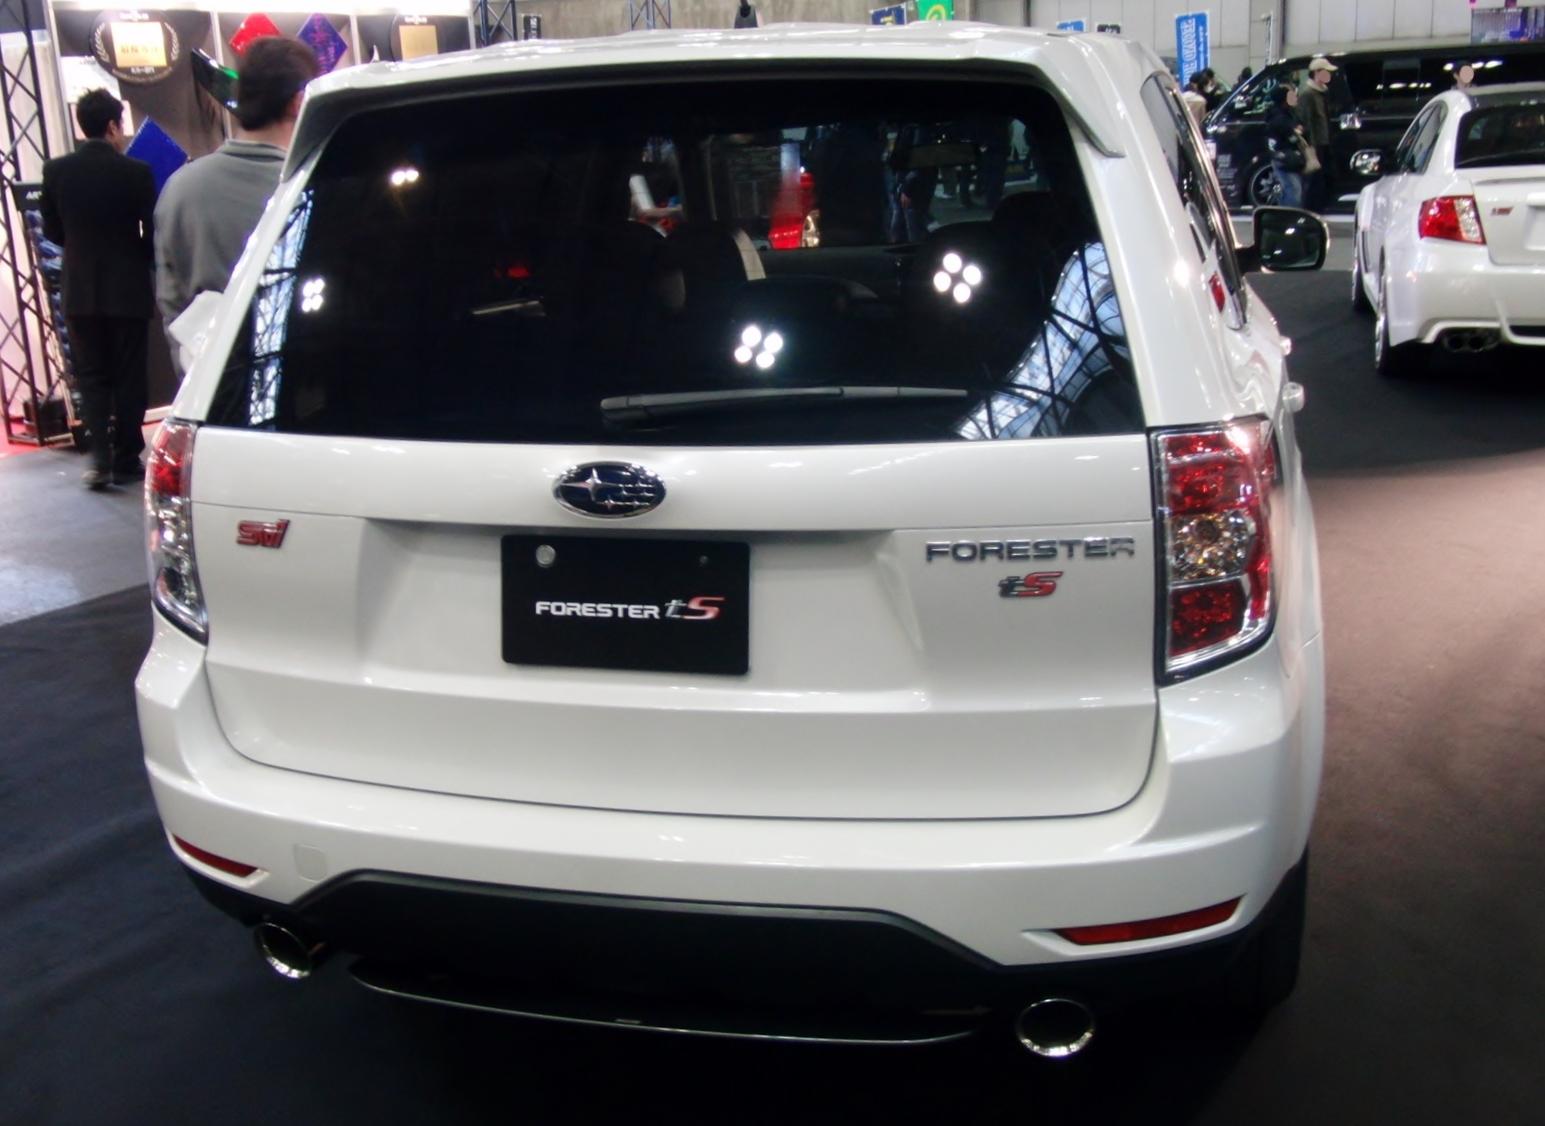 File Nagoya Auto Trend 2011 52 Subaru Forester Ts Jpg Wikimedia